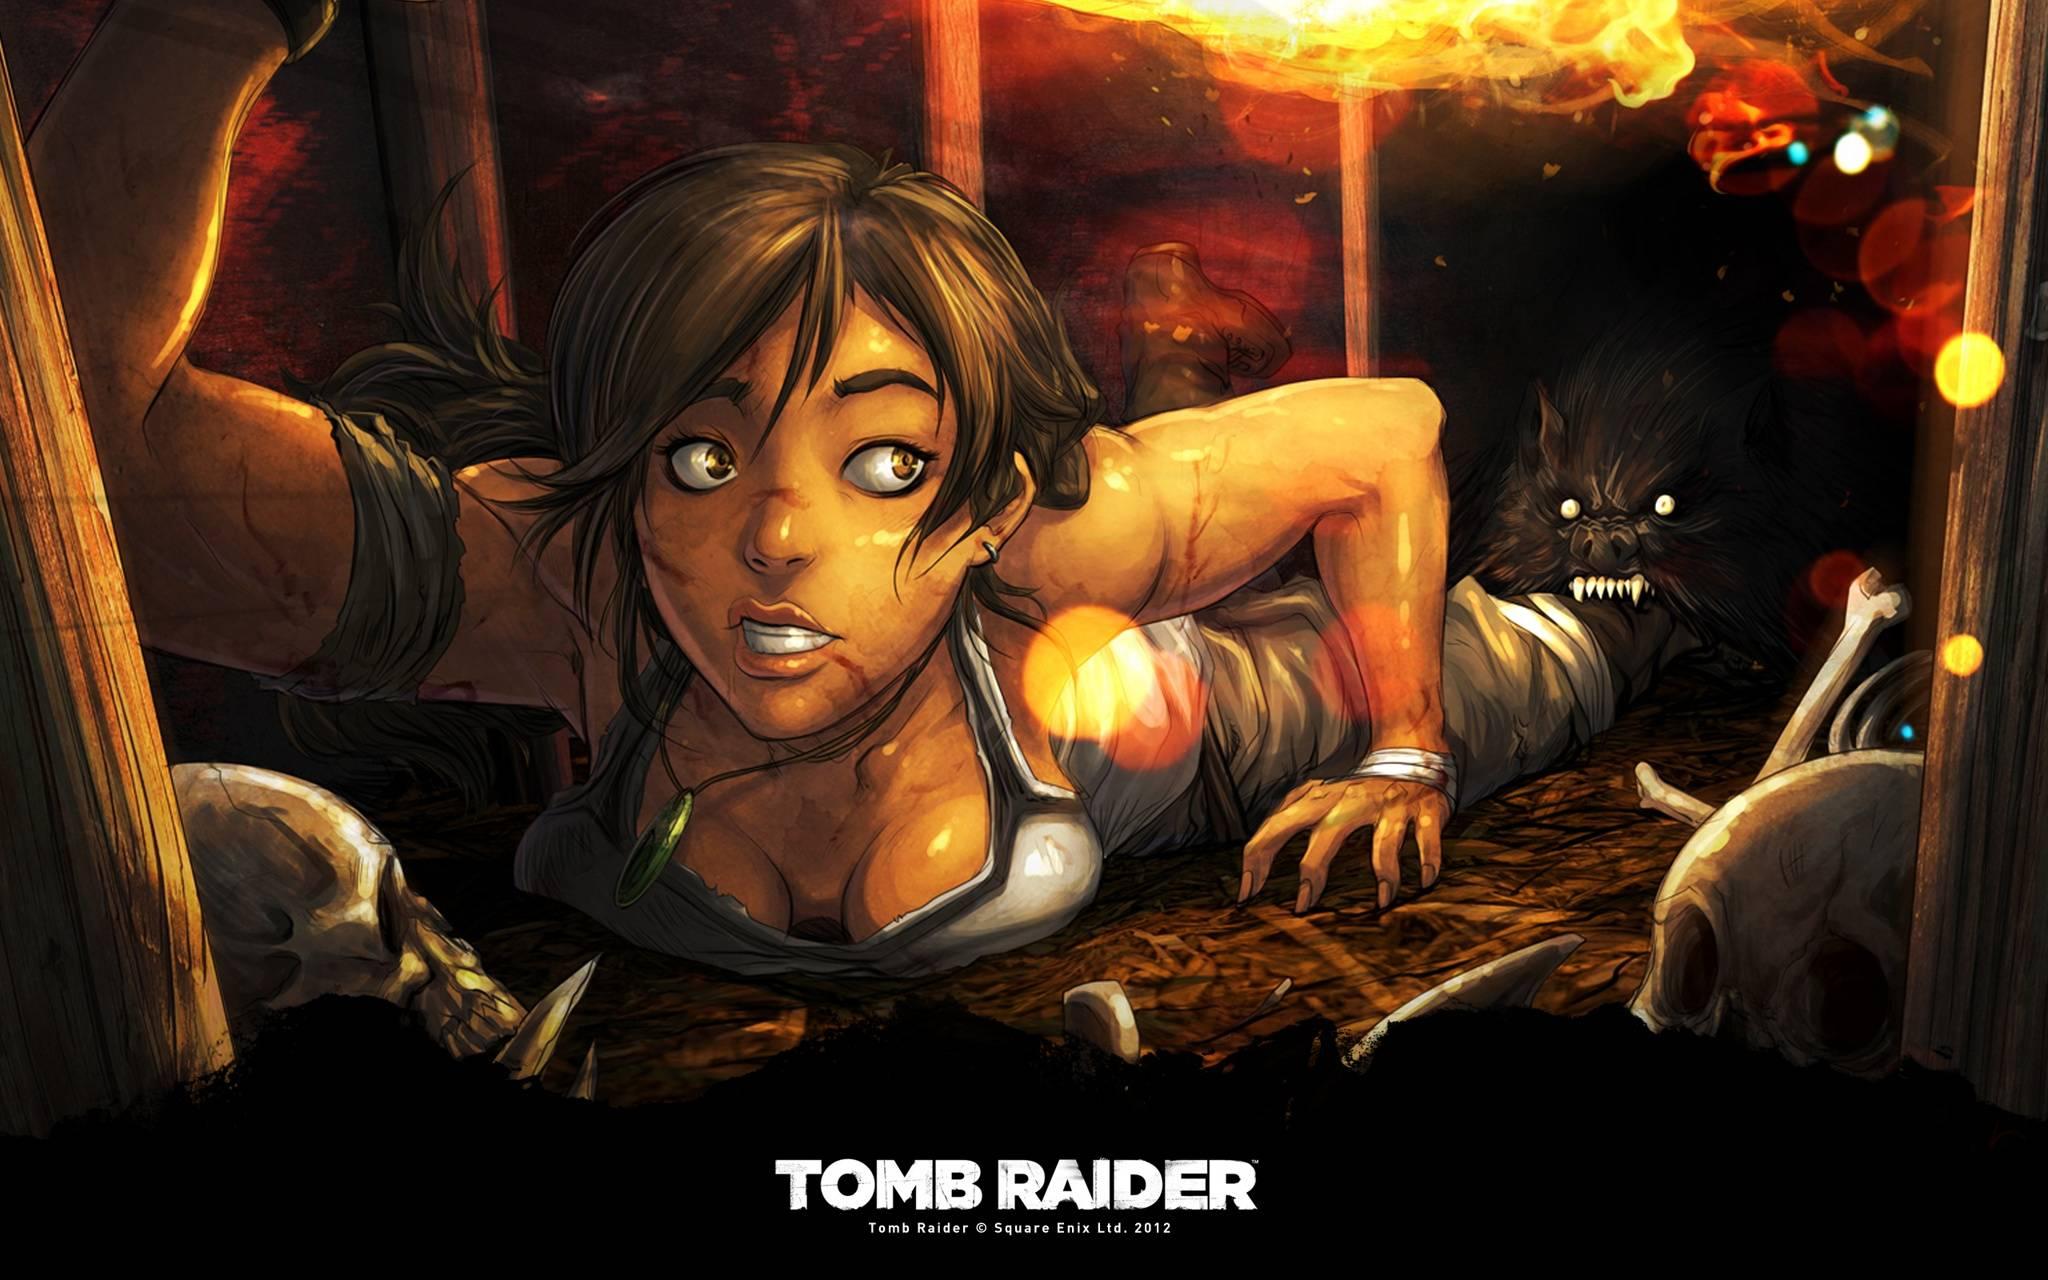 New Tomb Raider Art